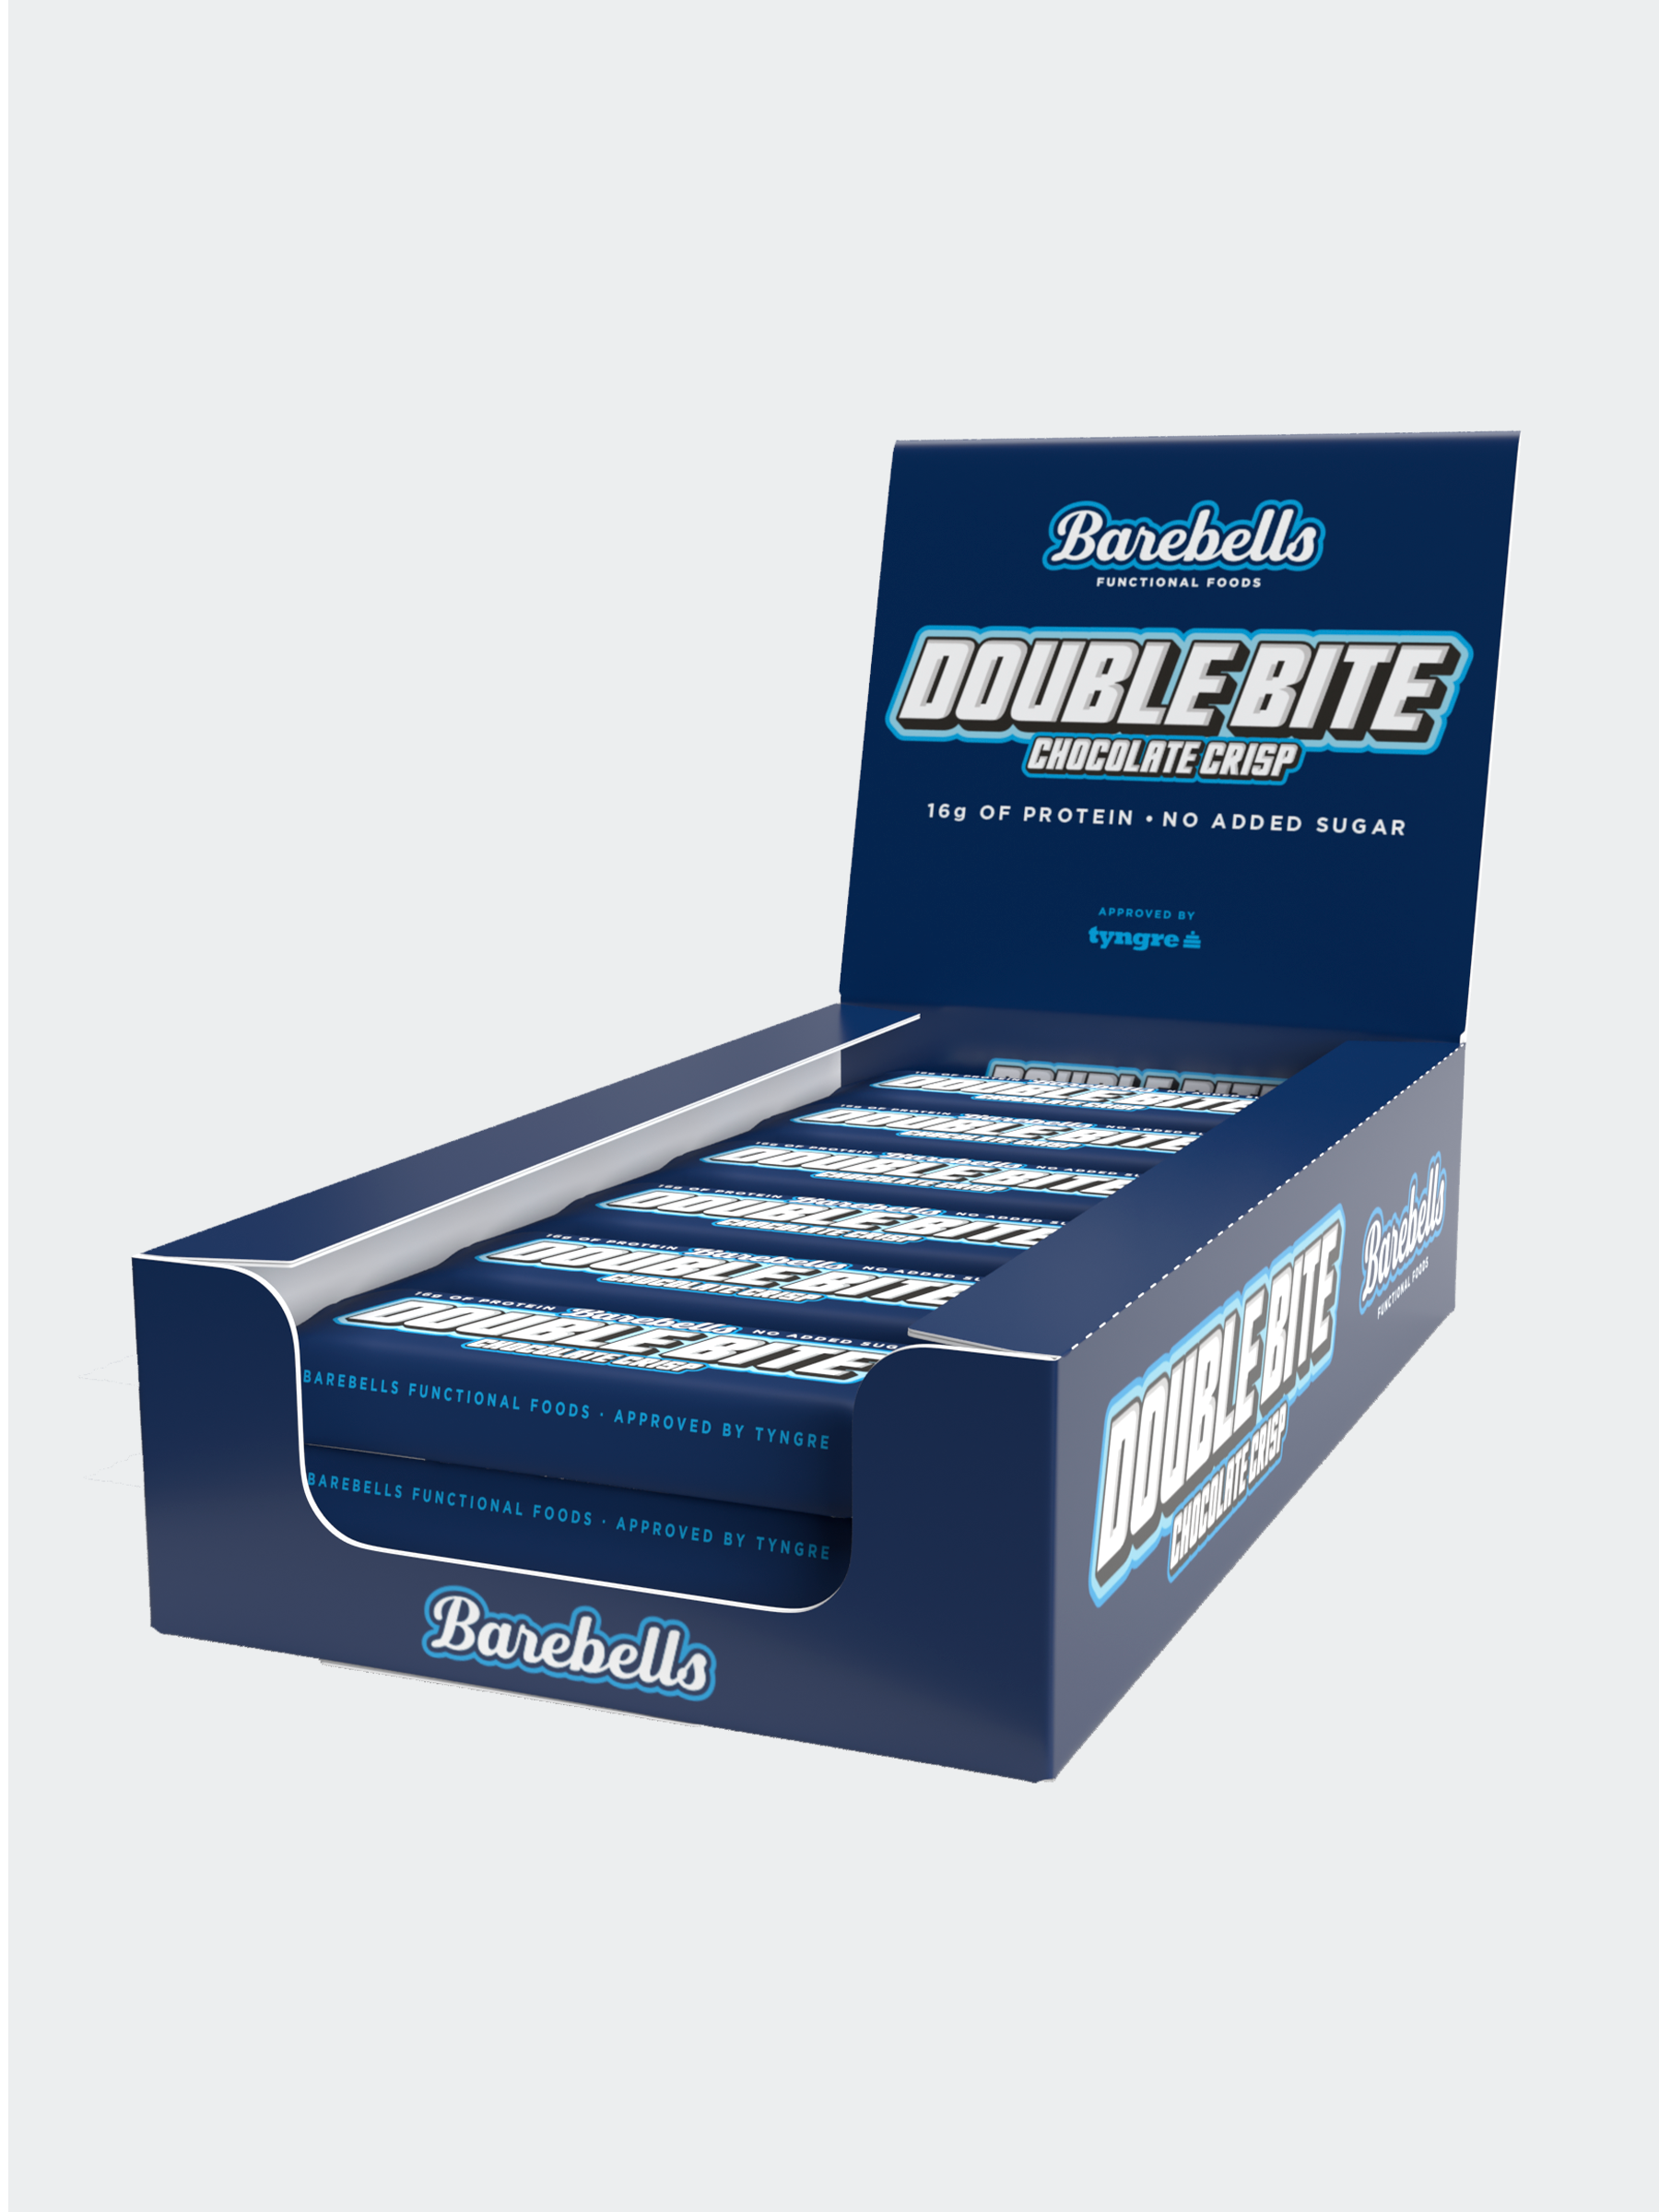 Barebells Double Bite Chocolate Crisp 12-pack